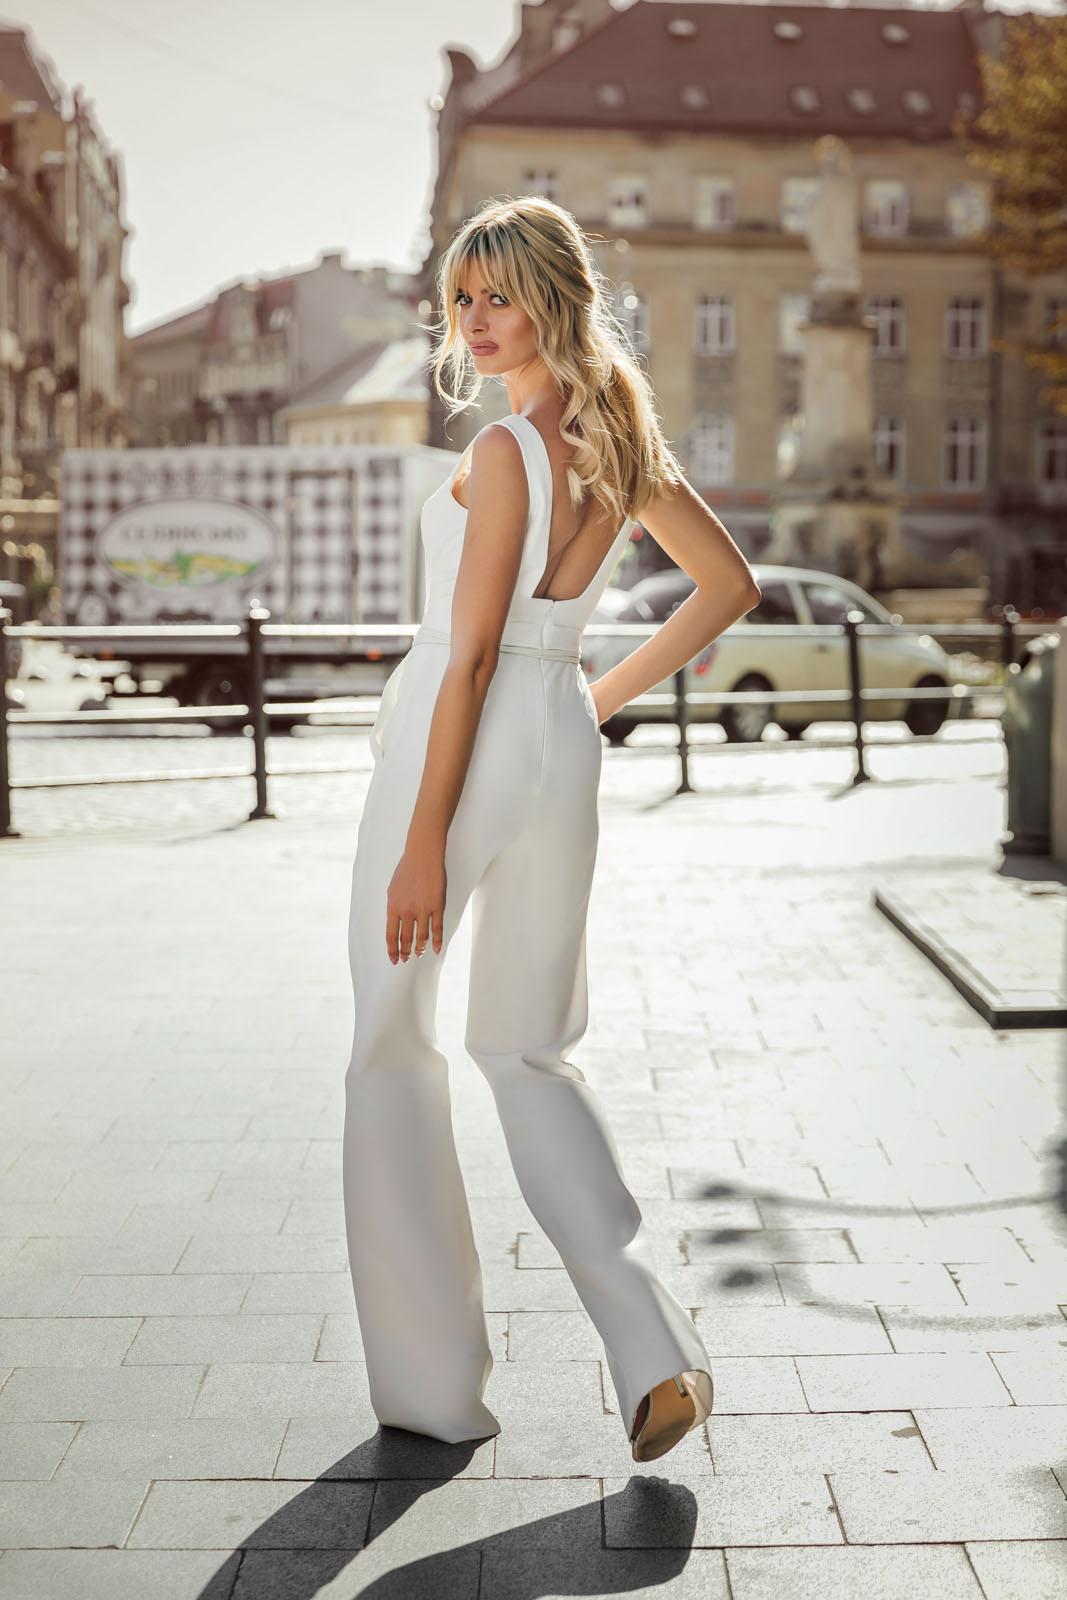 DESIRE-Oksana Mukha - Kolekcja 2021